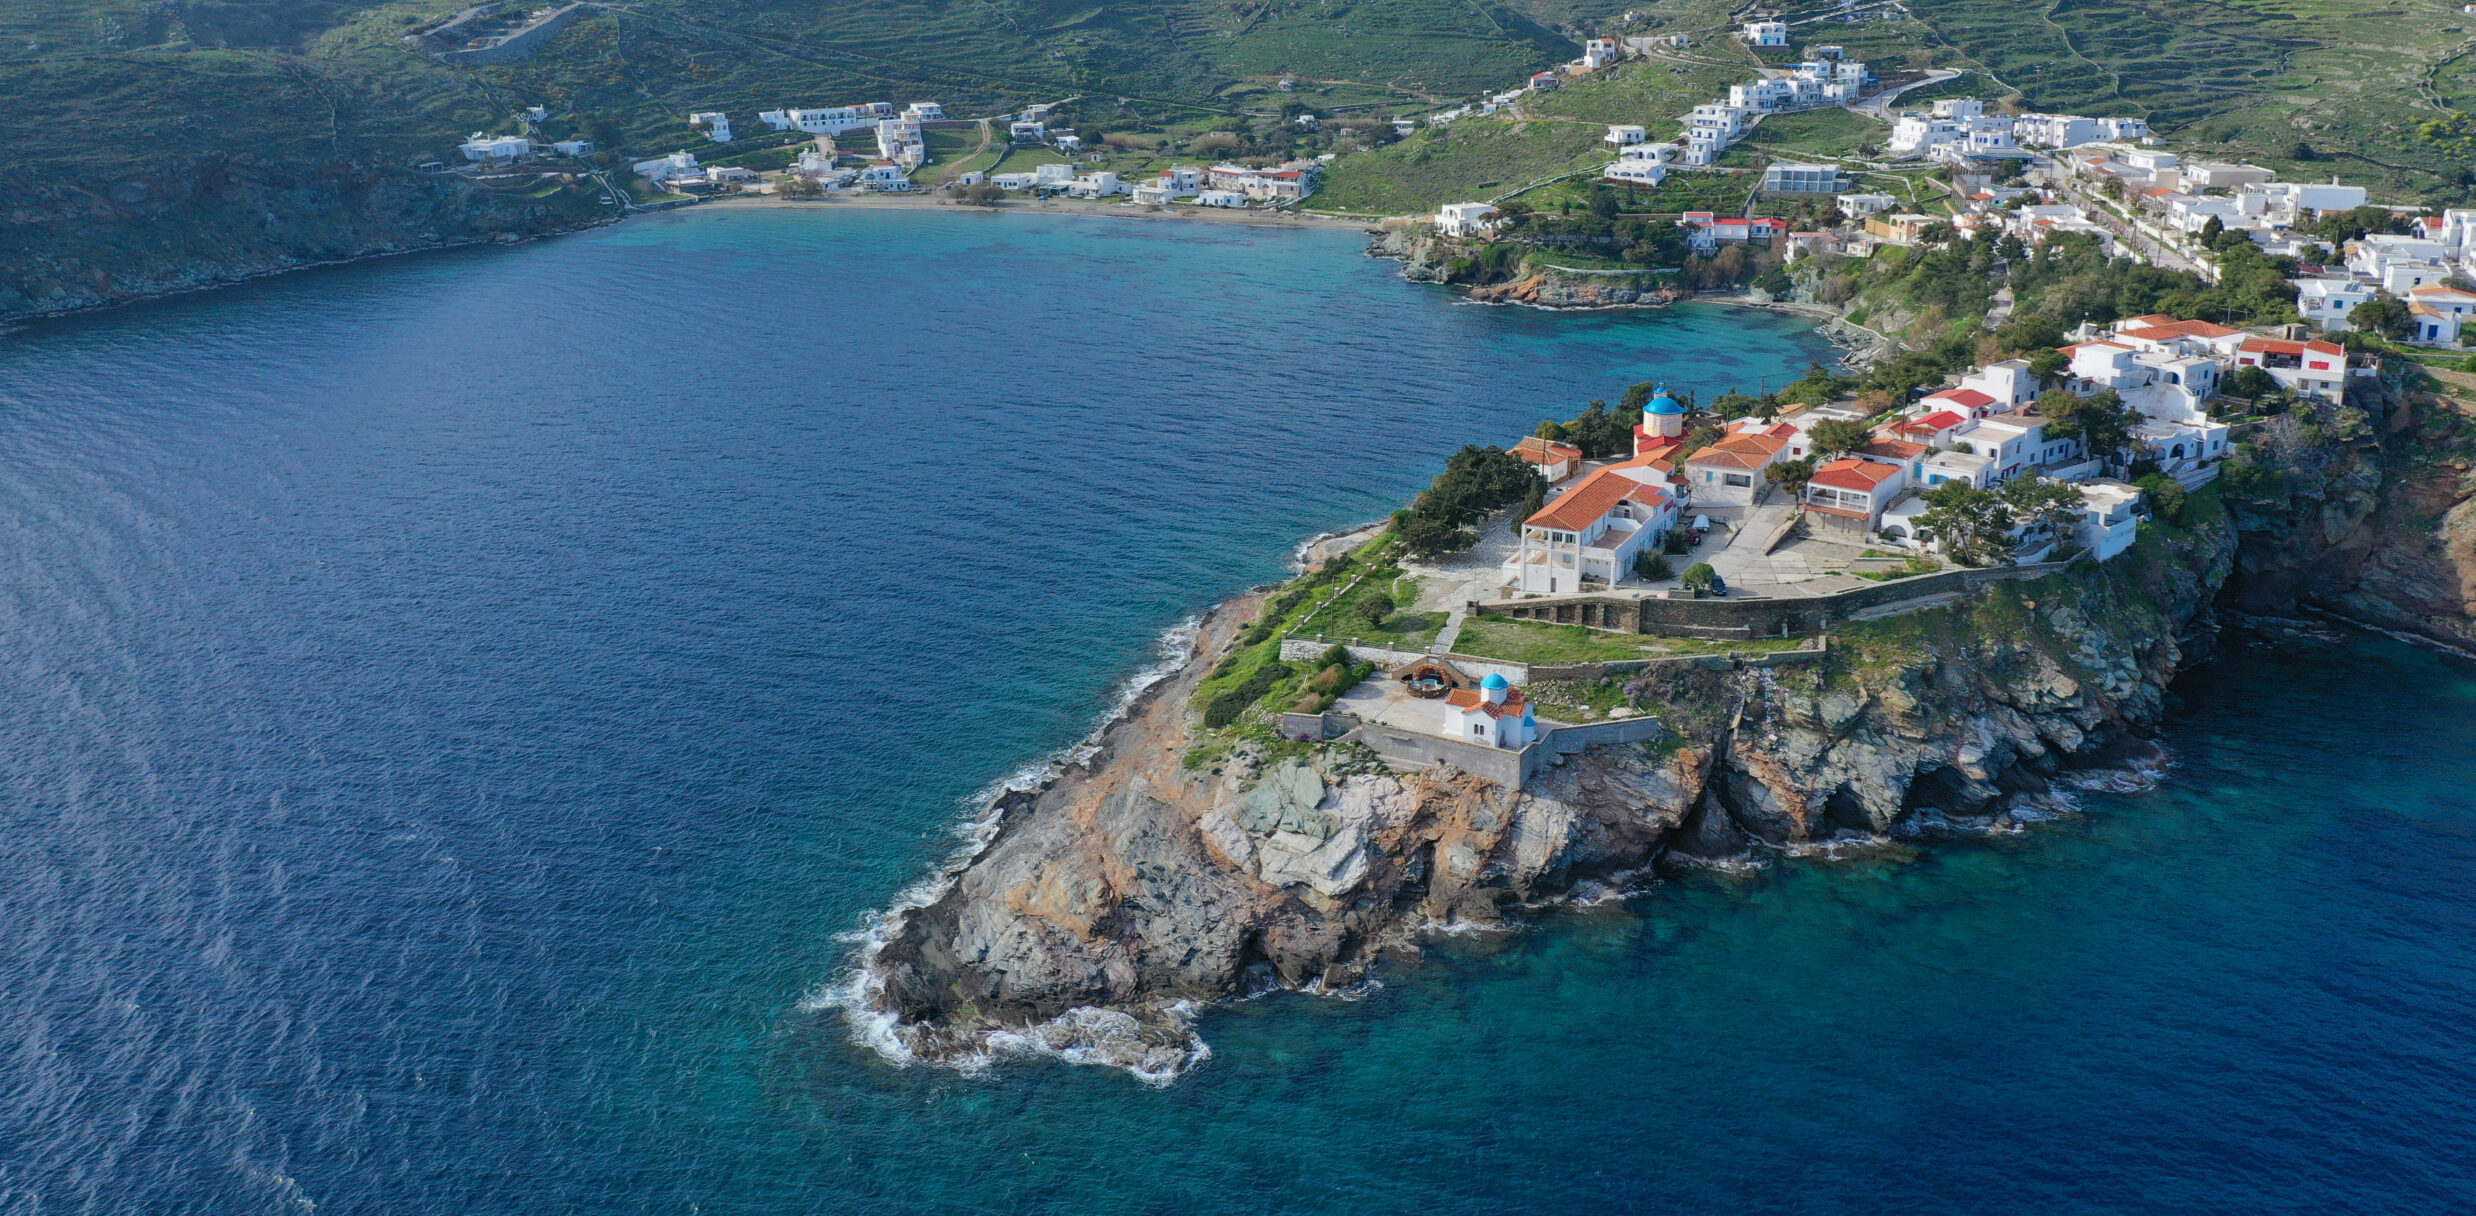 Kythnos island: Economic and unforgettable